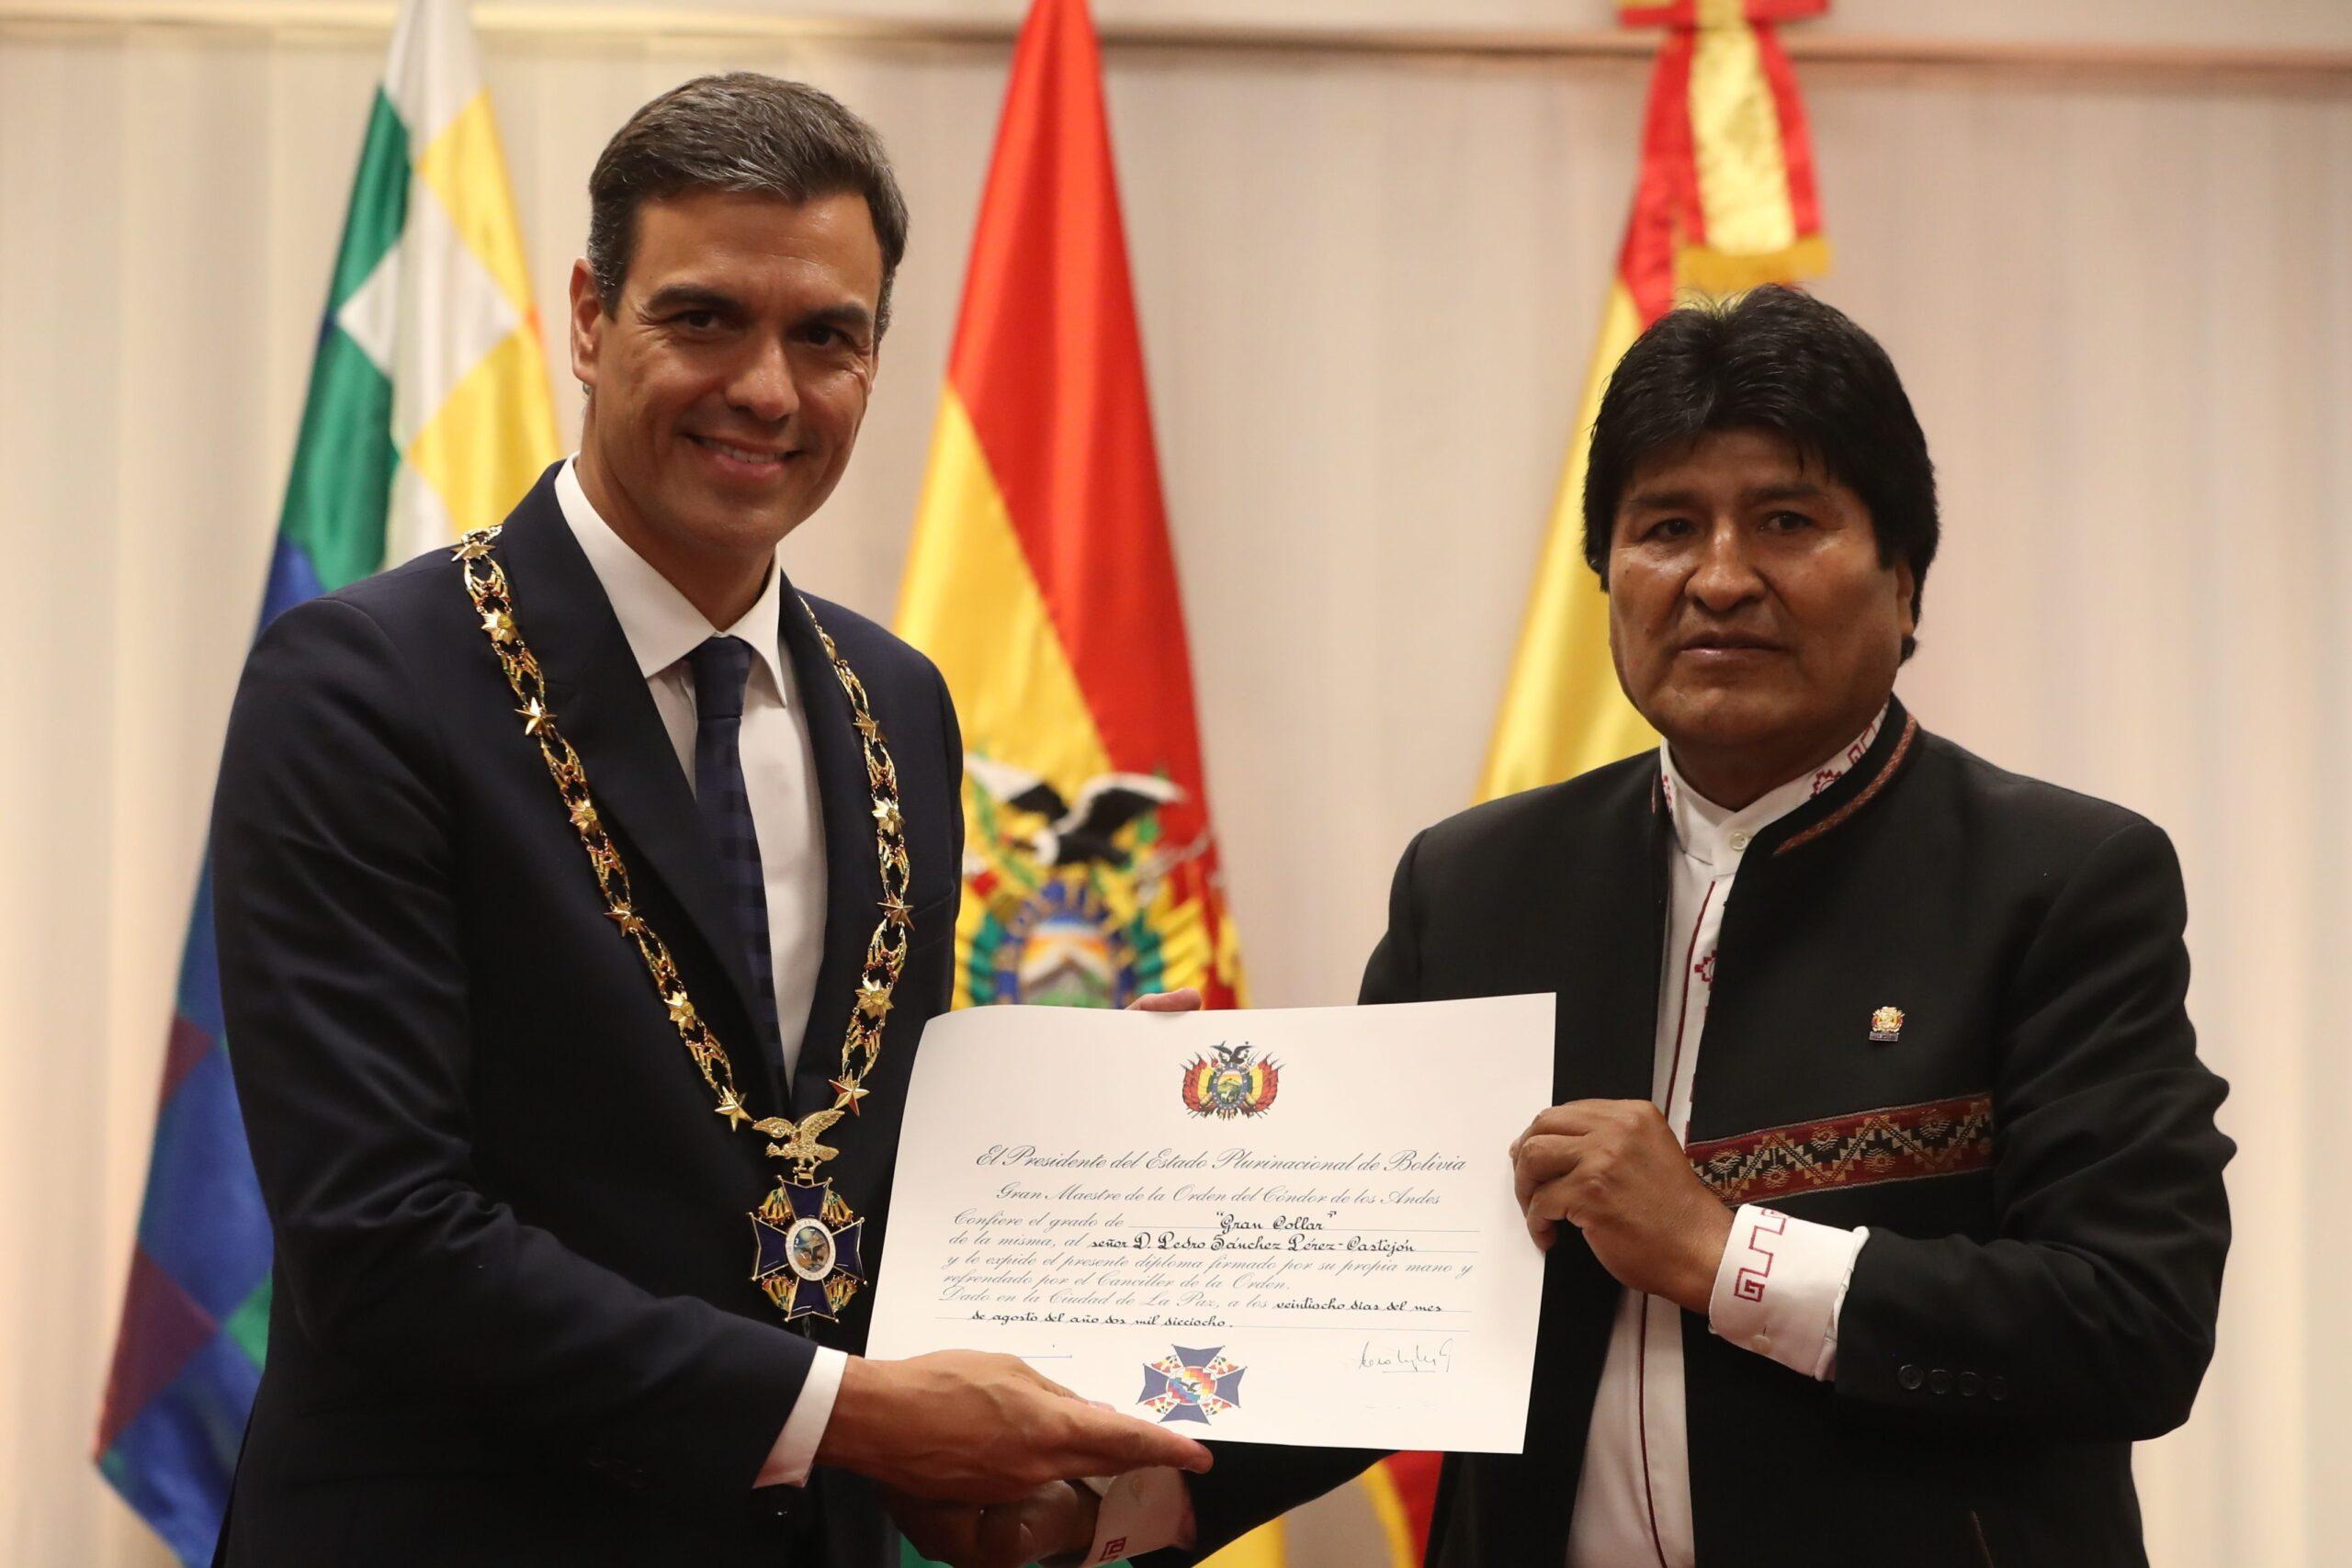 Pedro Sánchez amb Evo Morales